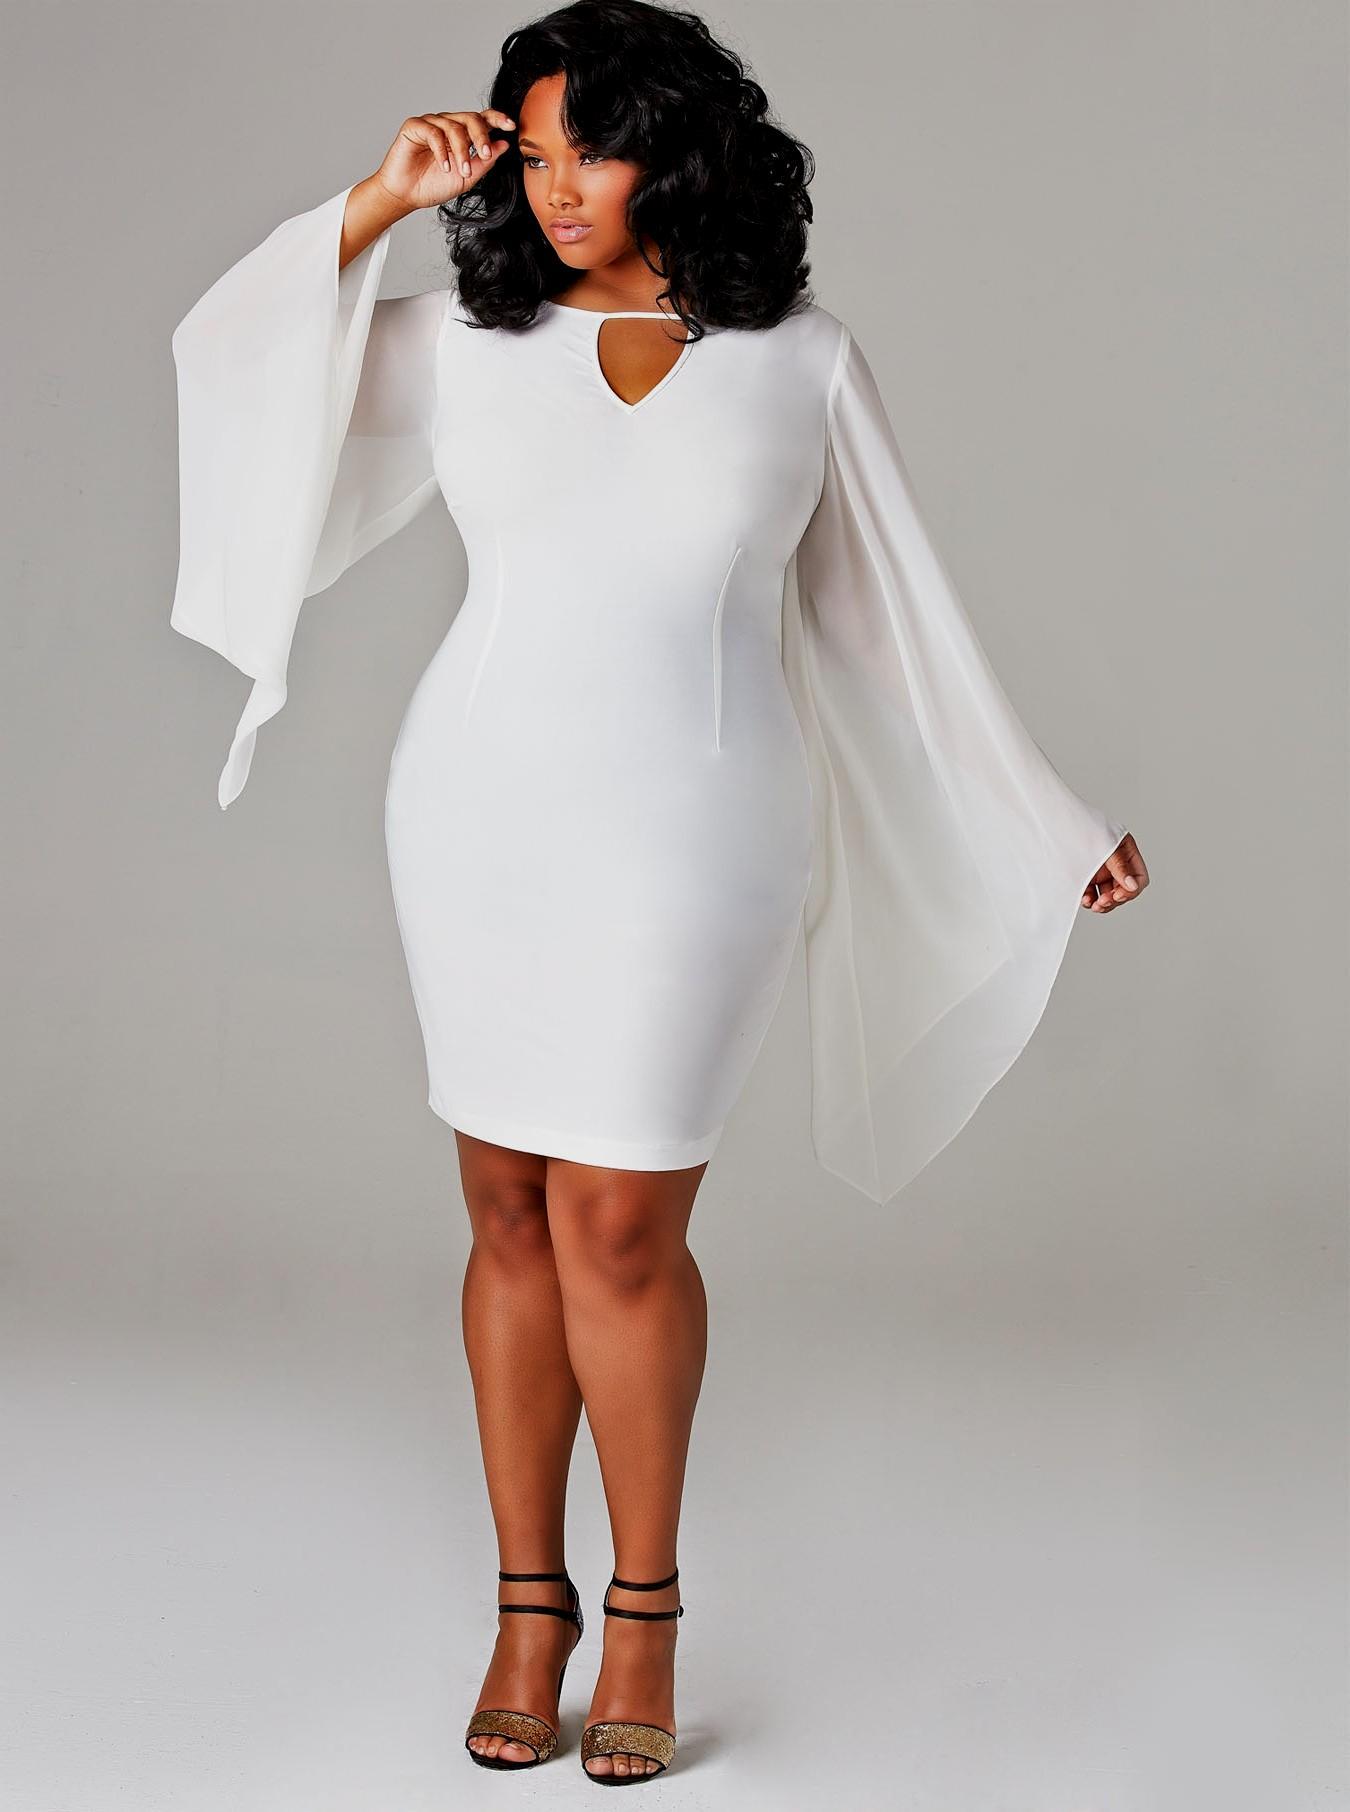 white plus size dresses white dresses plus size long - style jeans voiusoj